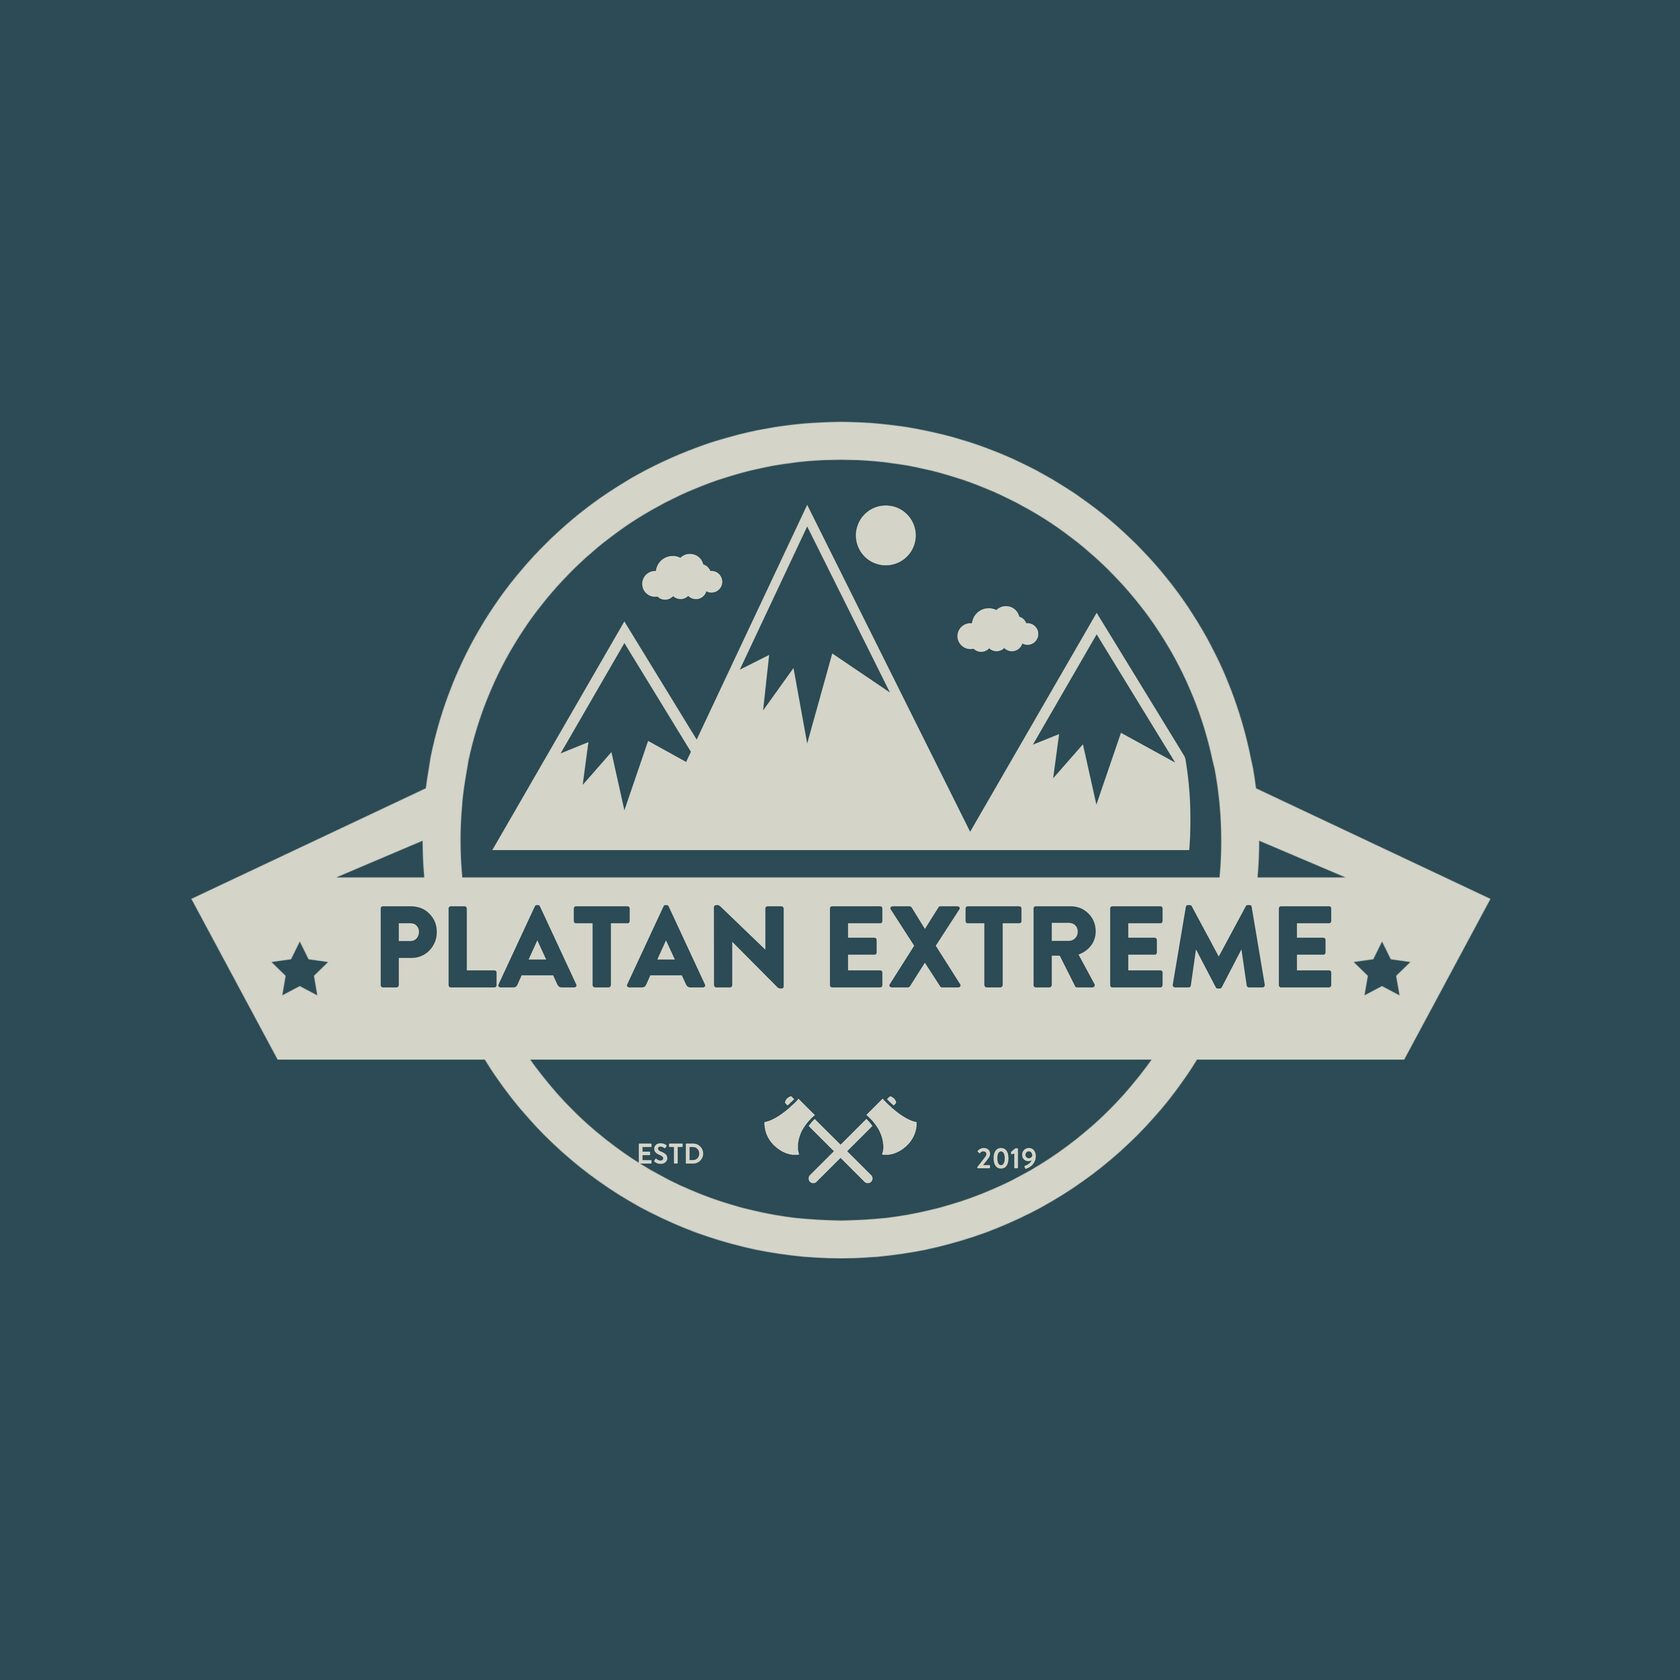 Platan Extreme